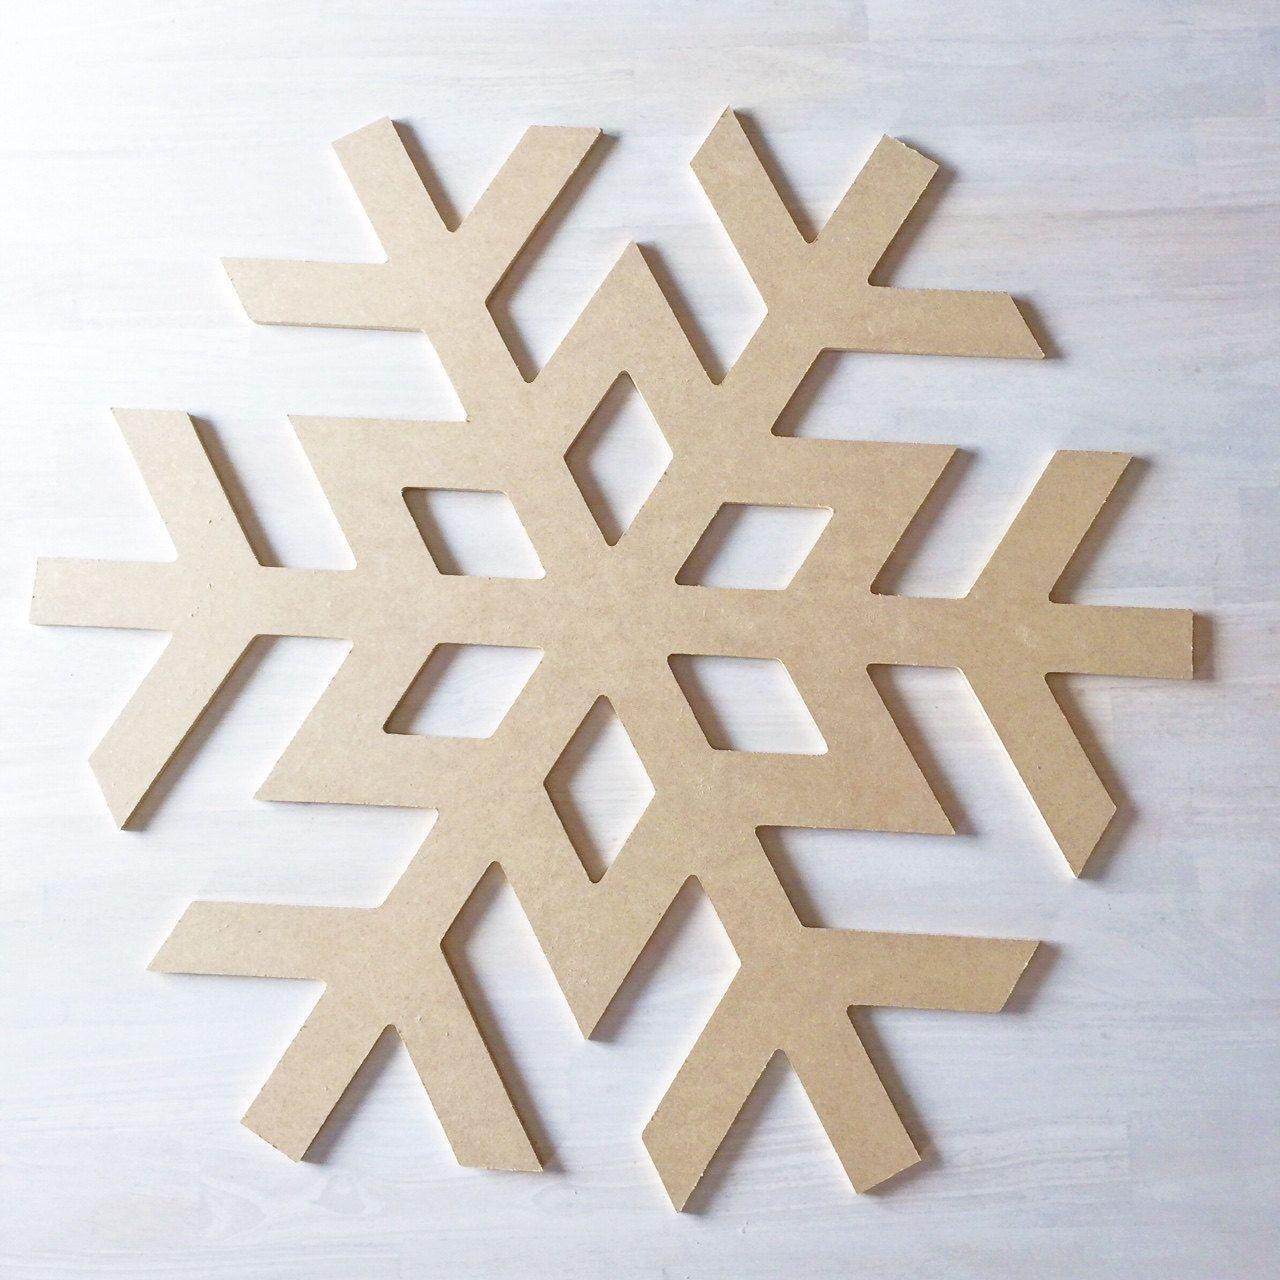 Snowflake Large Word Art Wood Cutouts Typography Christmas Wood Sign